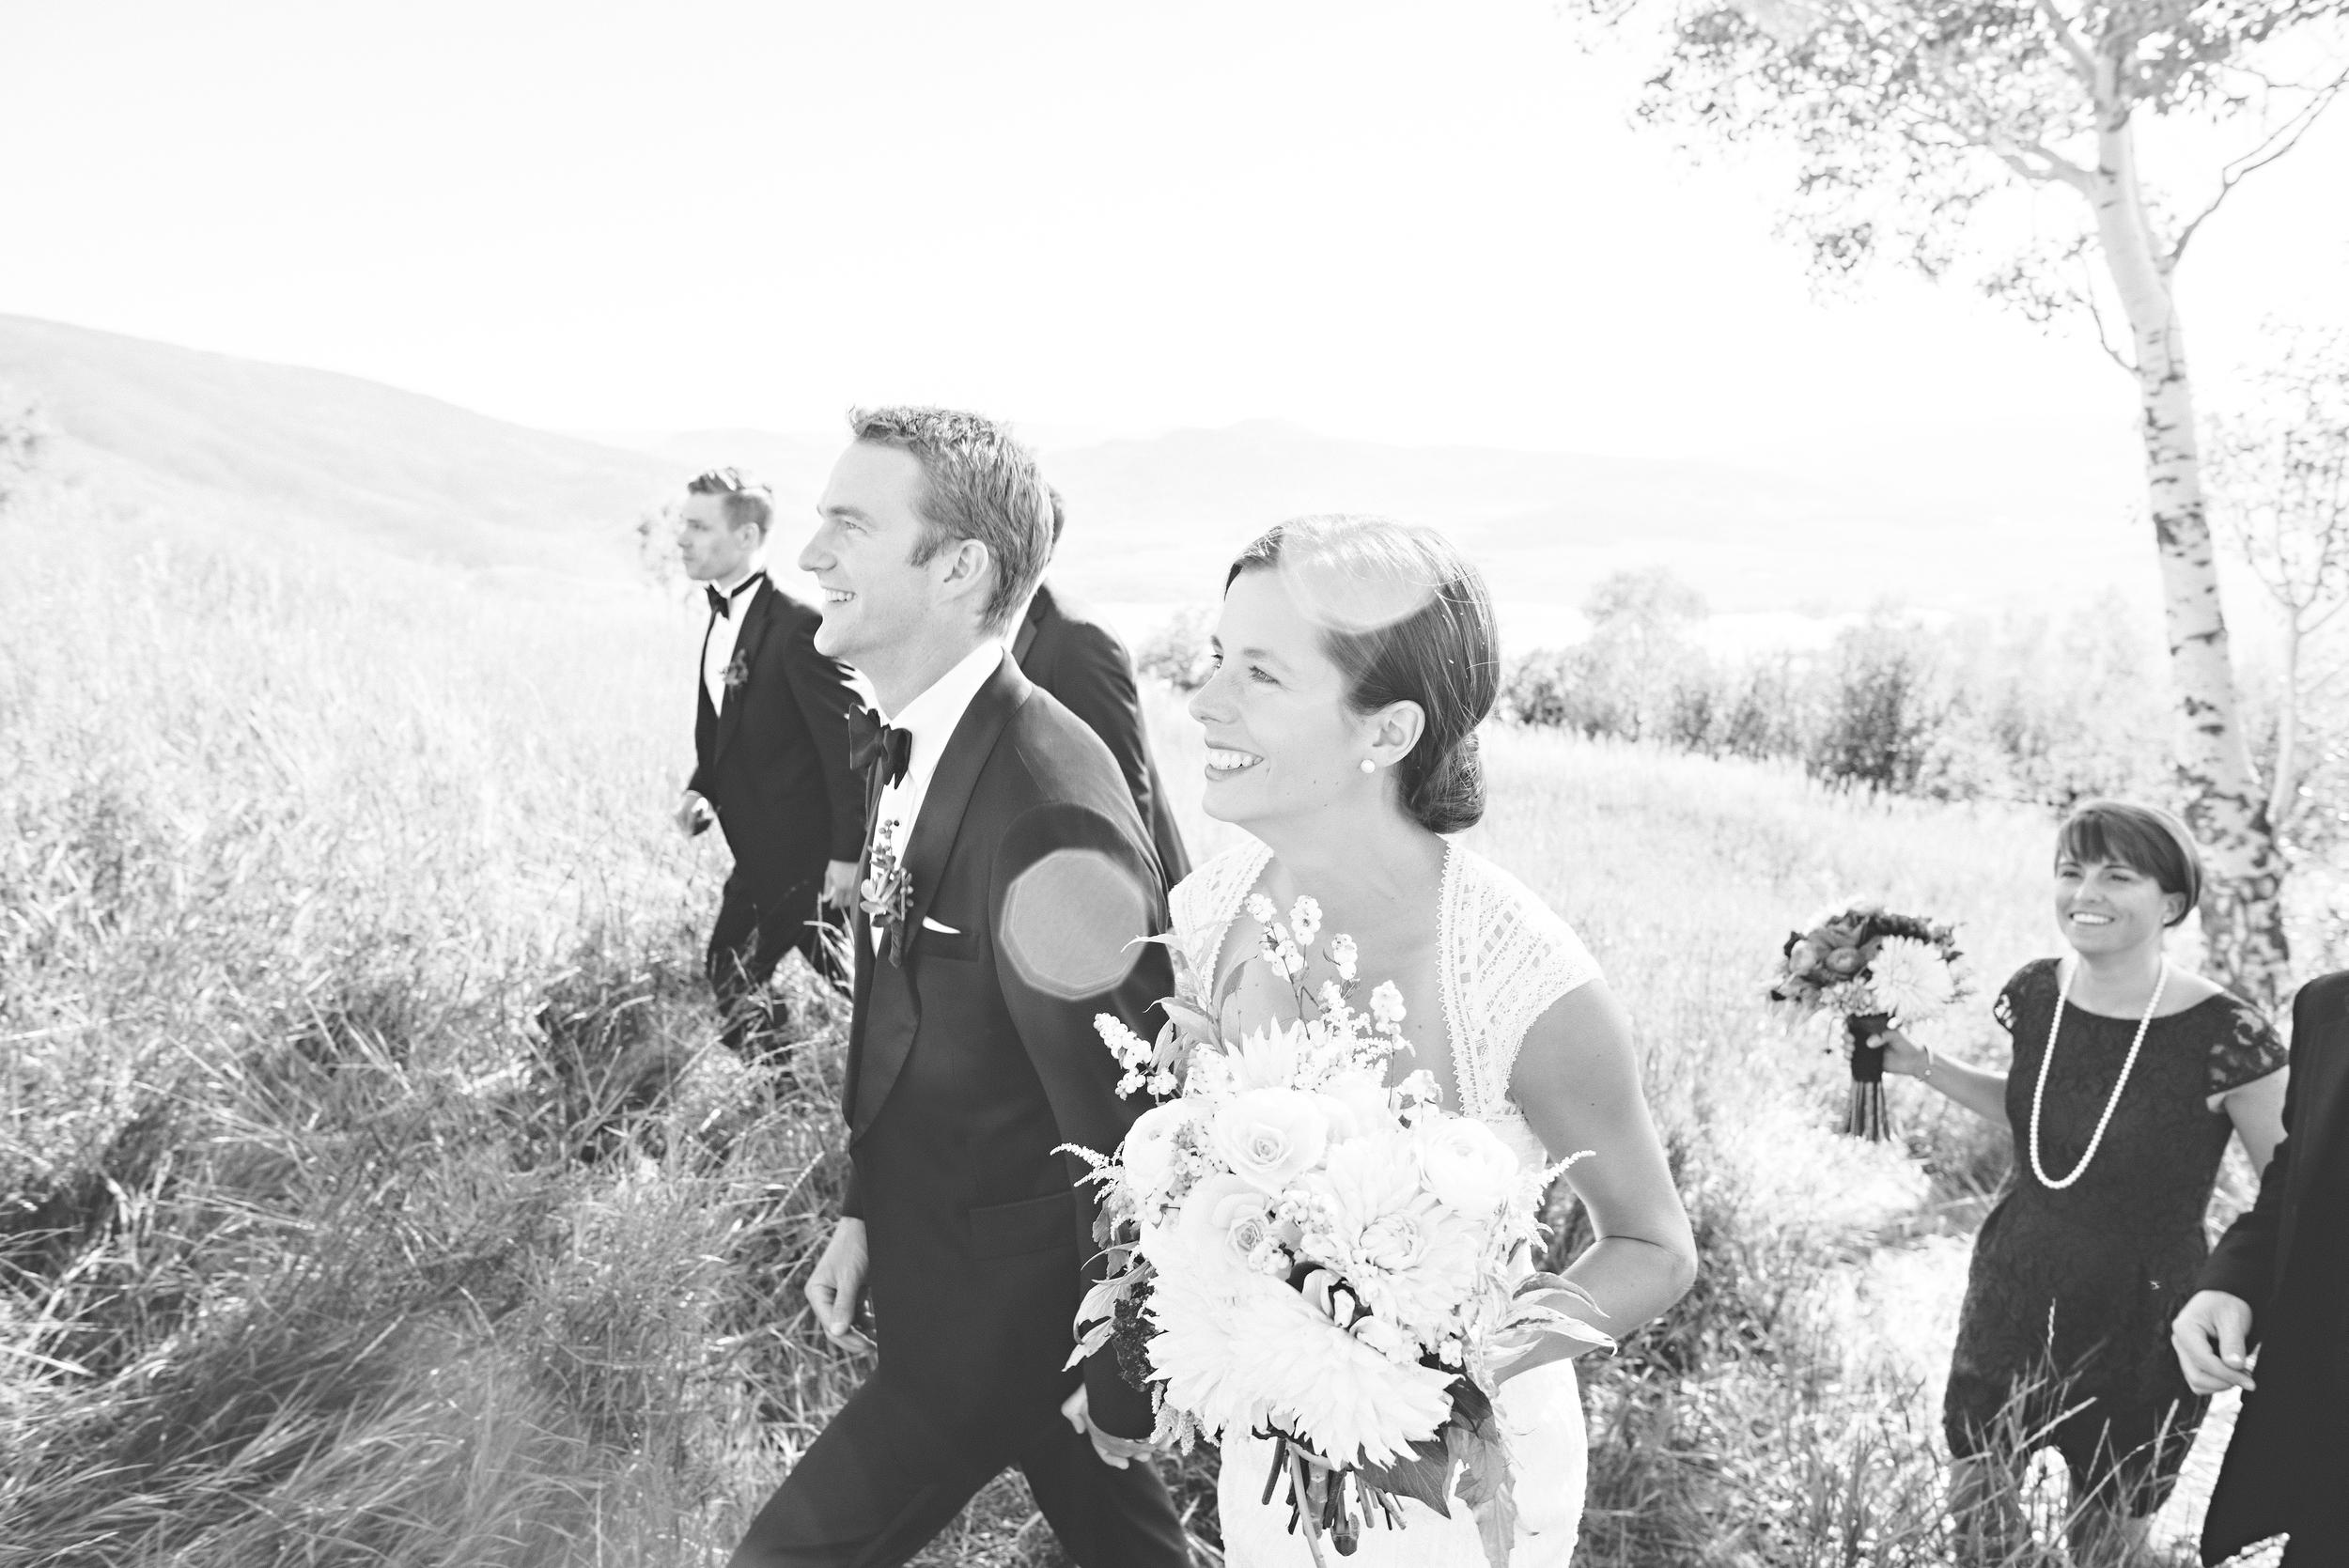 Brad&Libby_Wedding_Photos22016.jpg